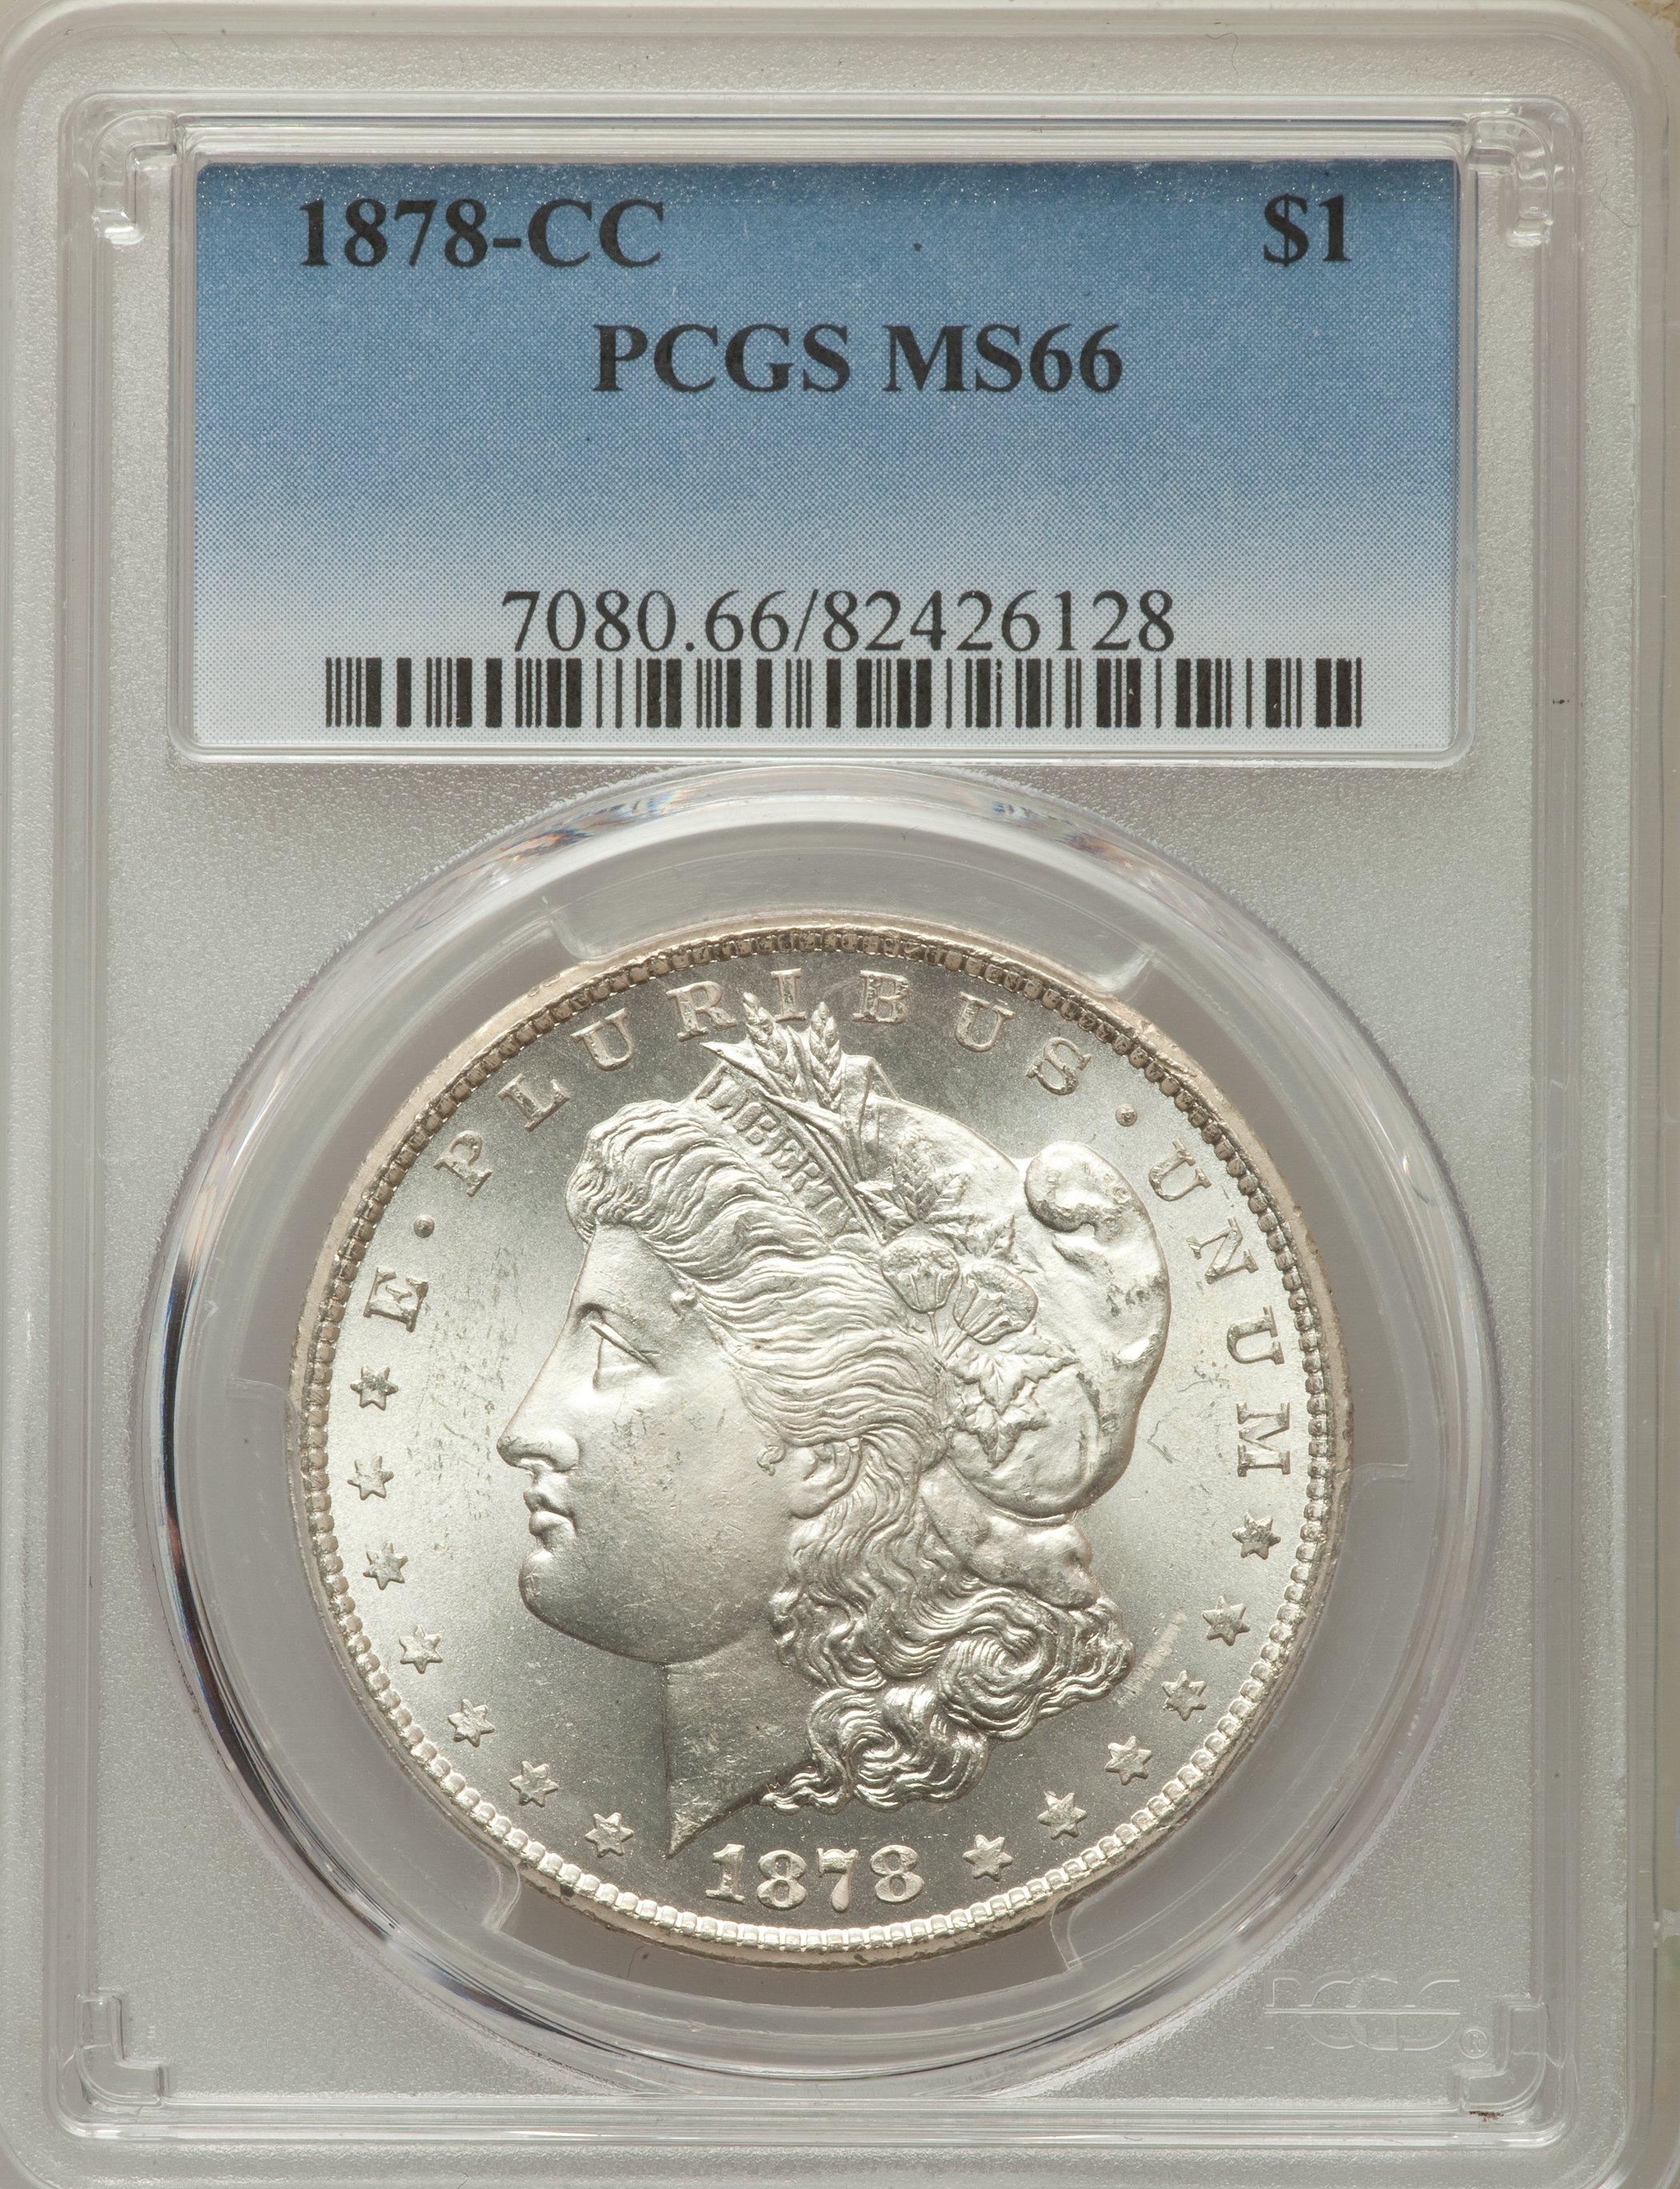 1878 Cc Us Morgan Silver Dollar 1 Pcgs Ms66 Ebay